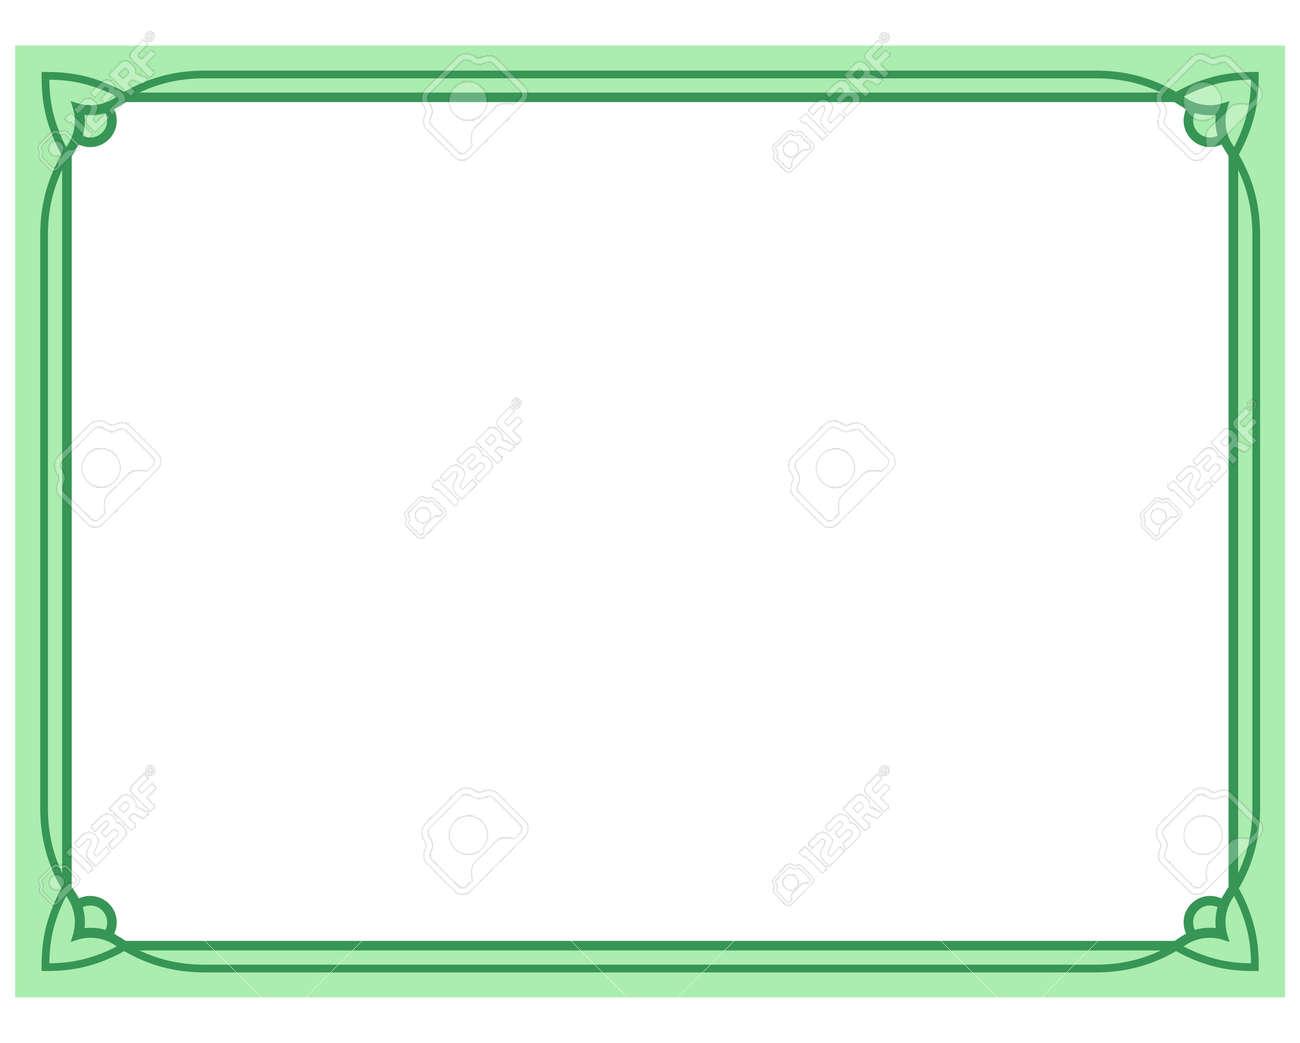 Simple Green Border